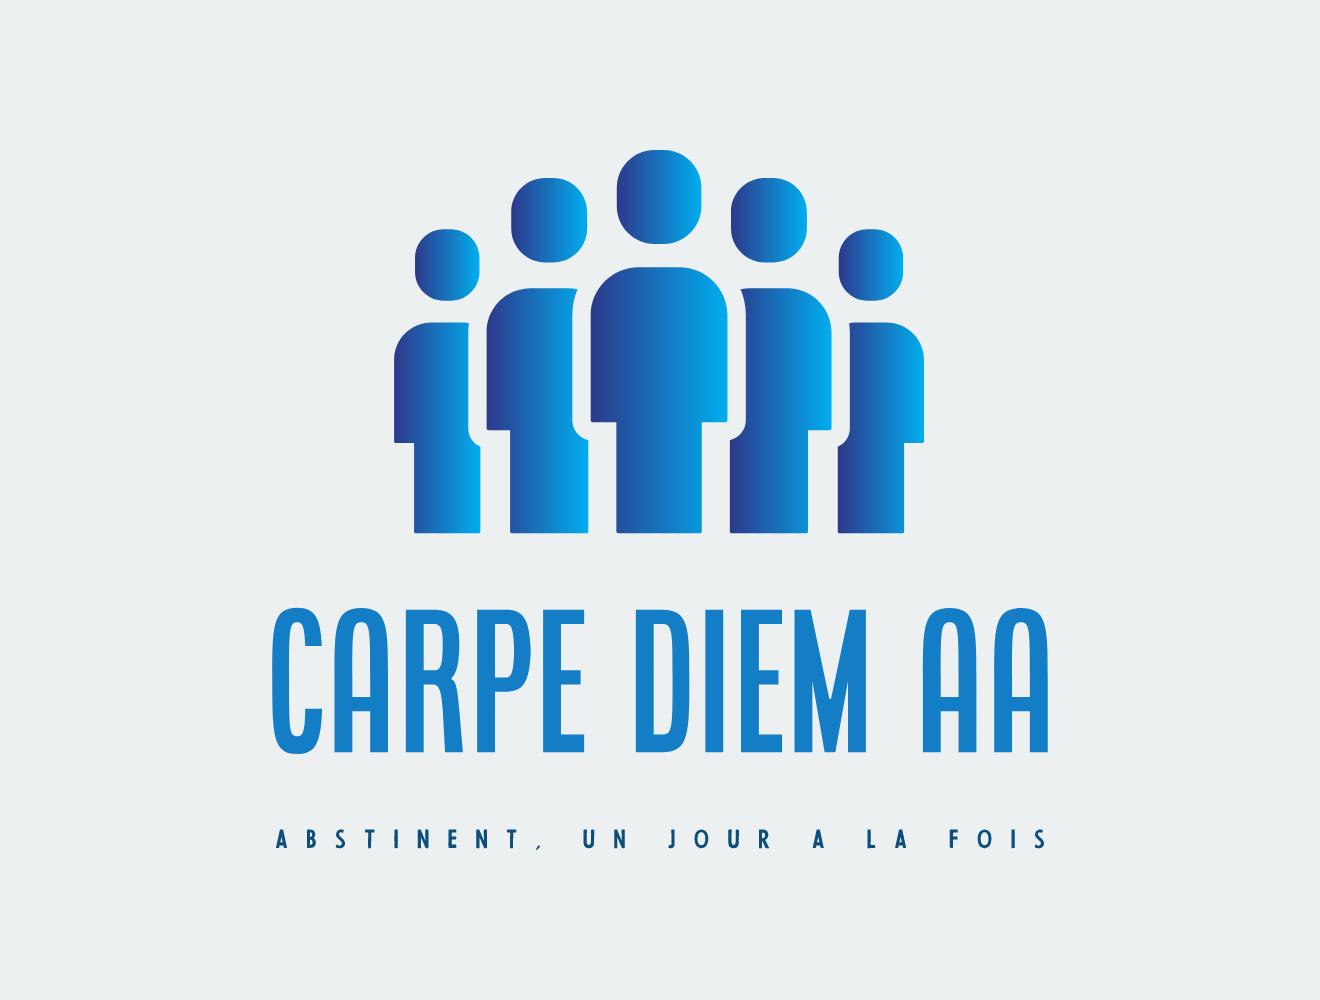 Carpe Diem aa